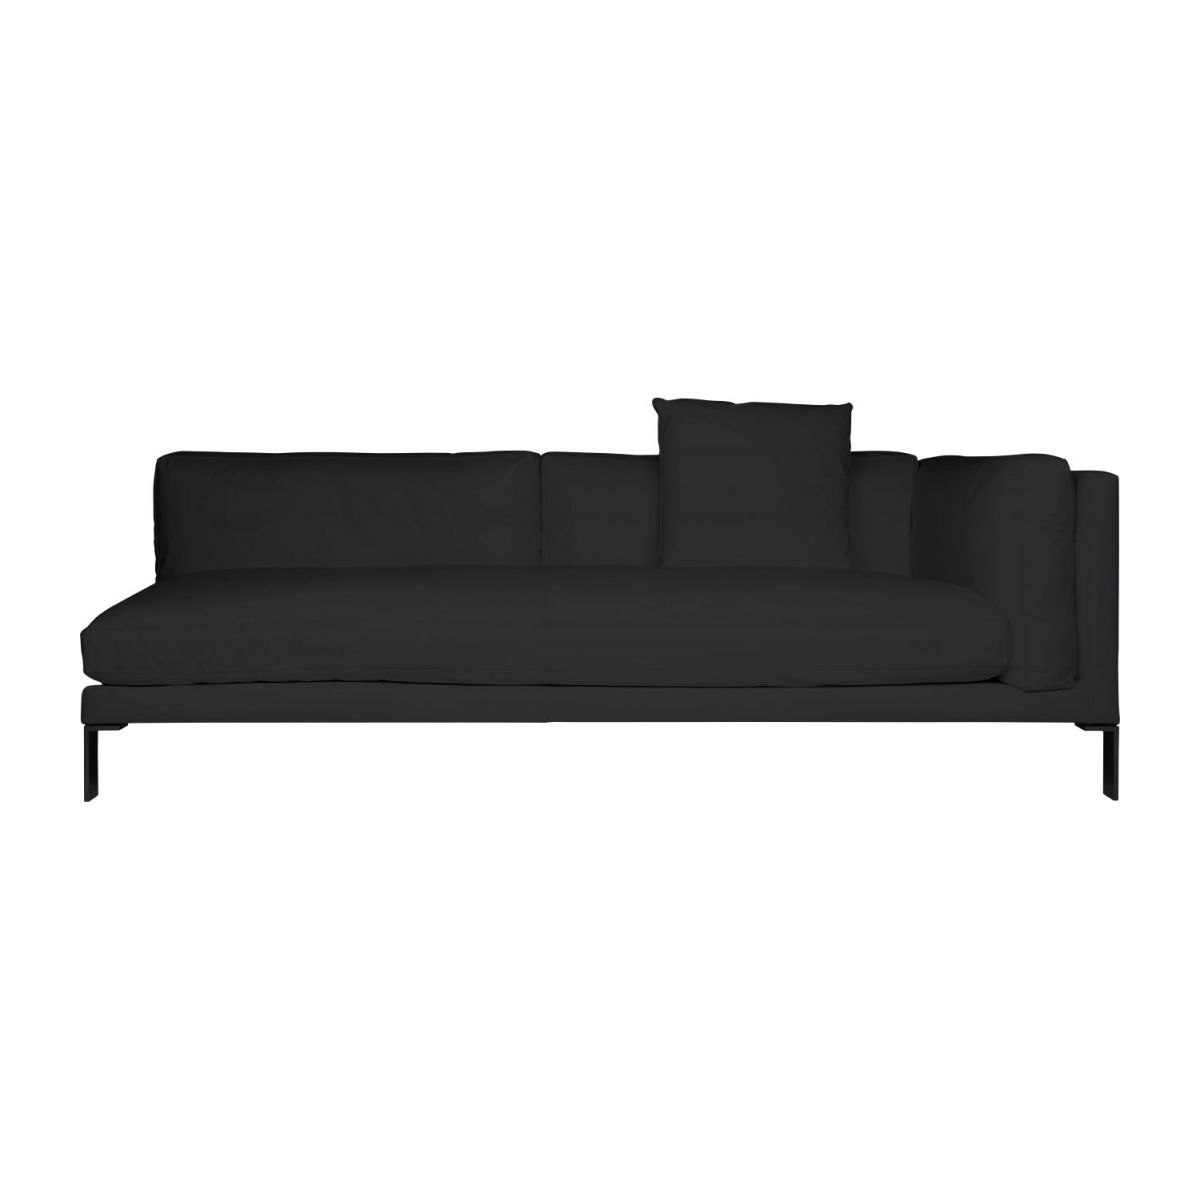 Reposabrazos sofa D0dg Newman sofà 3 Plazas De Piel Negro Con Reposabrazos Izquierdo